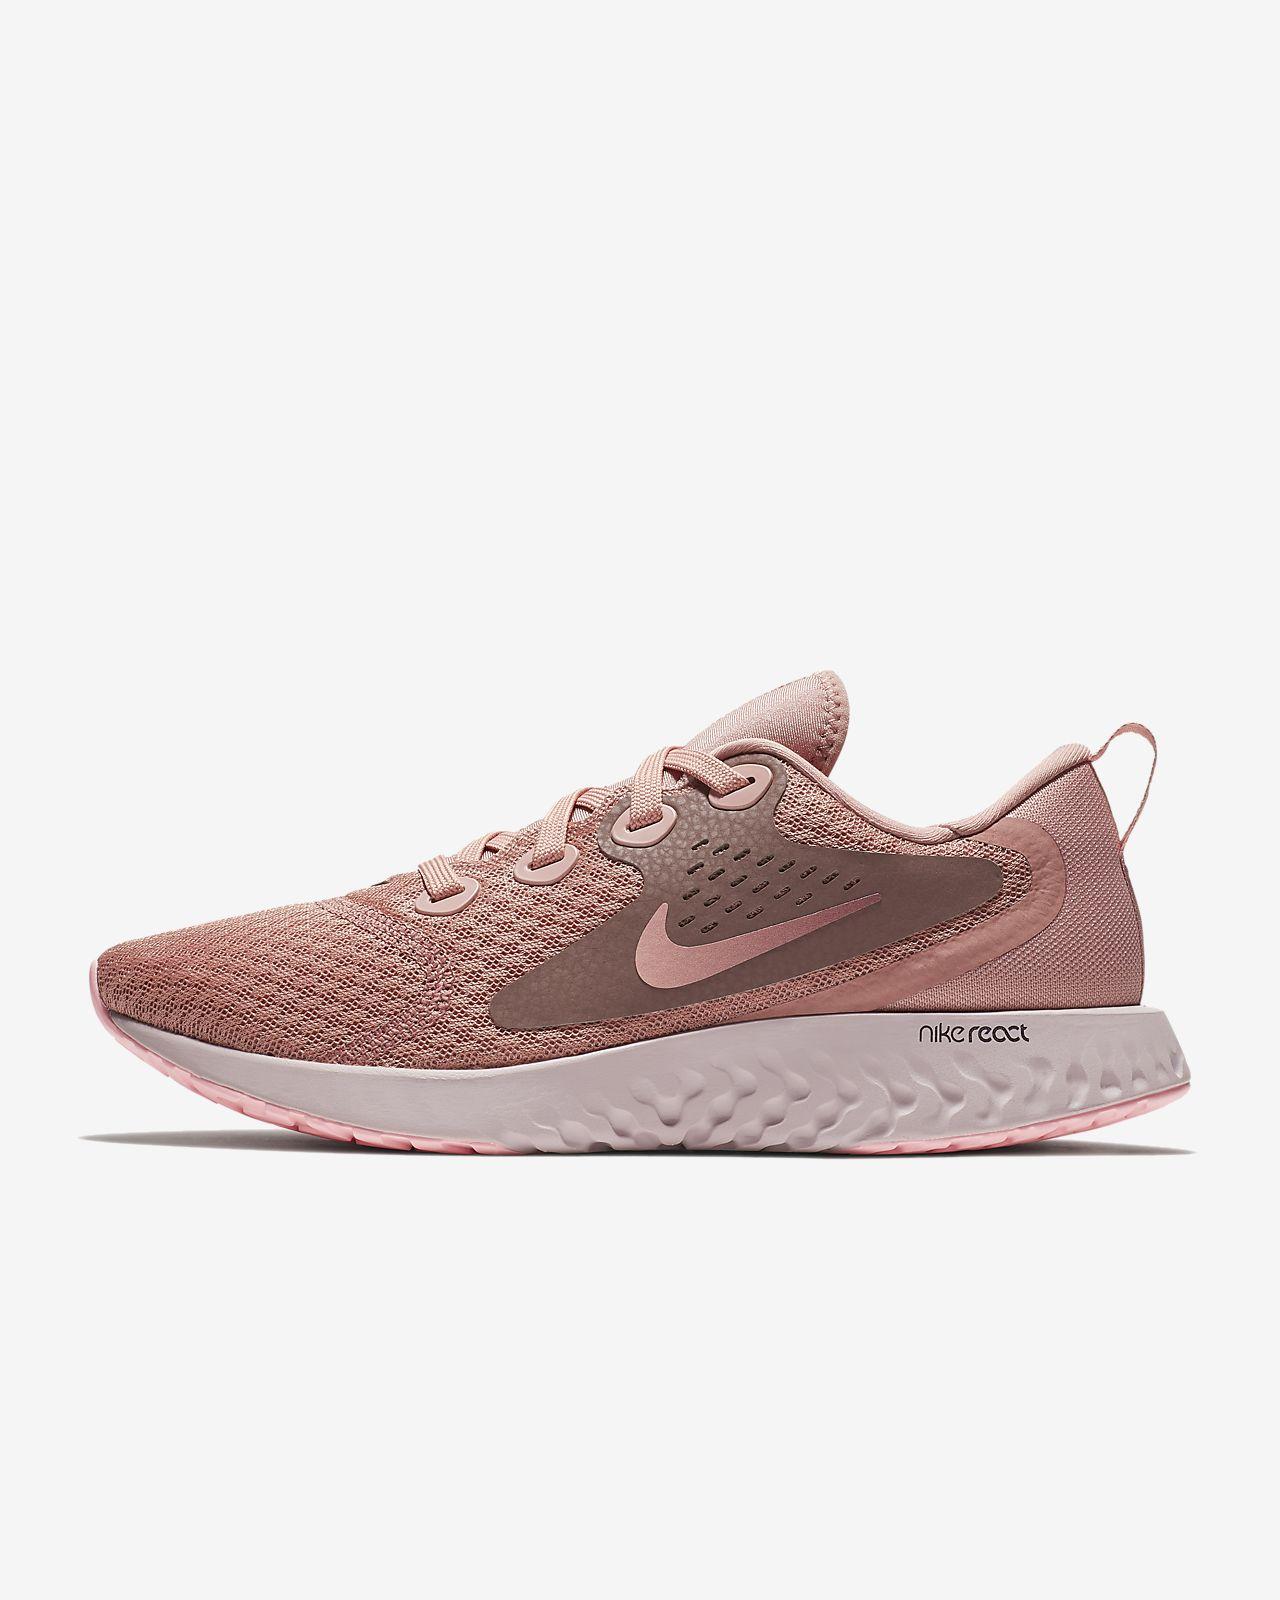 d5d2c8aaeca Nike Legend React Women s Running Shoe. Nike.com DK